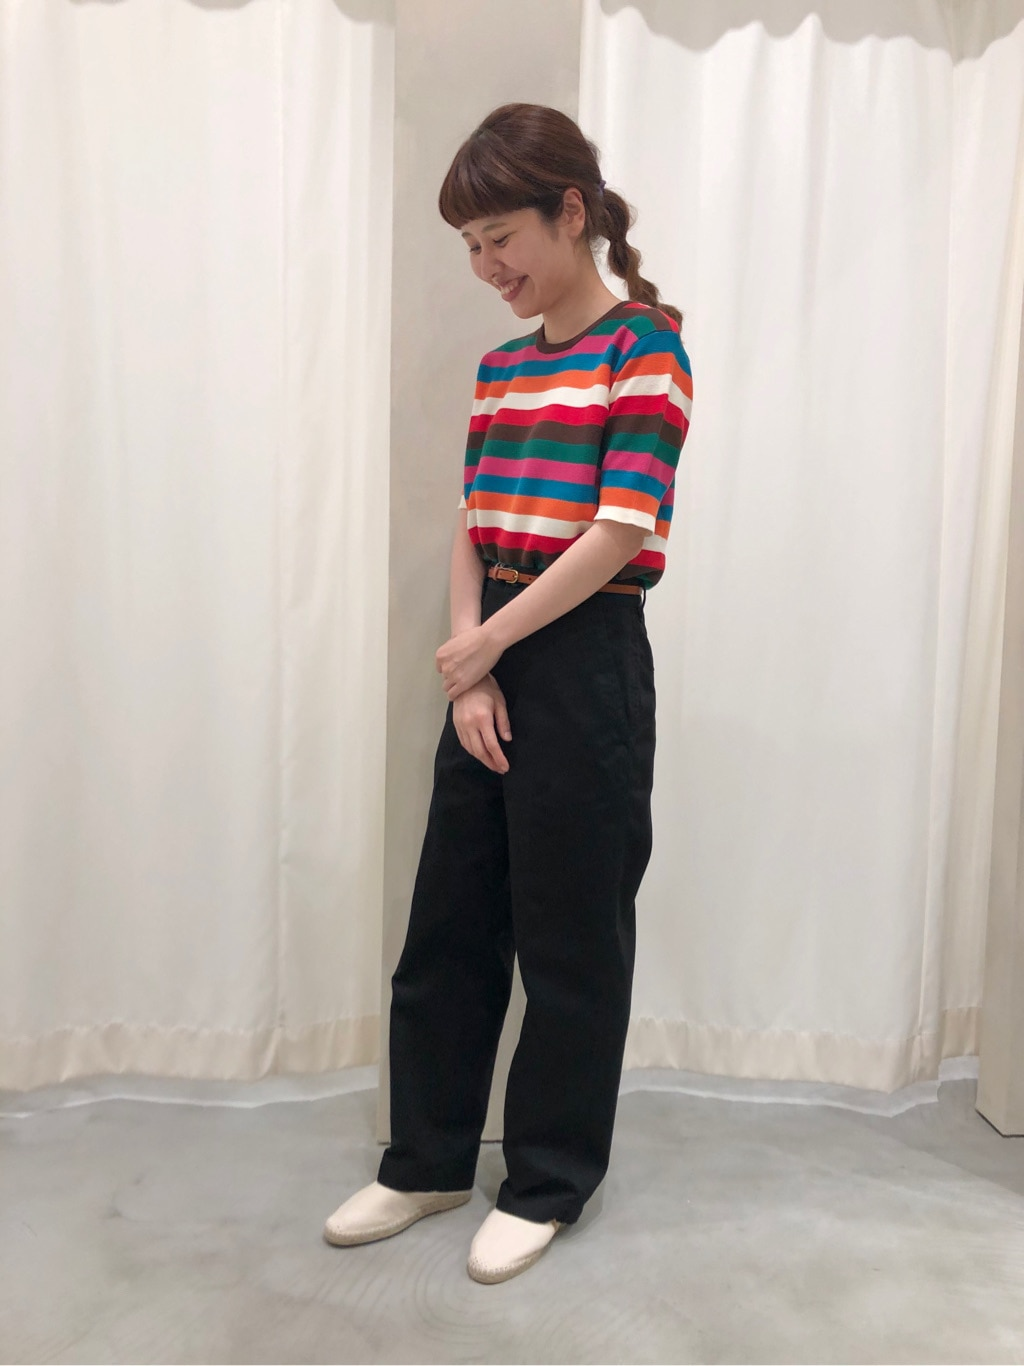 AMB SHOP CHILD WOMAN CHILD WOMAN , PAR ICI 東京スカイツリータウン・ソラマチ 身長:160cm 2020.07.07